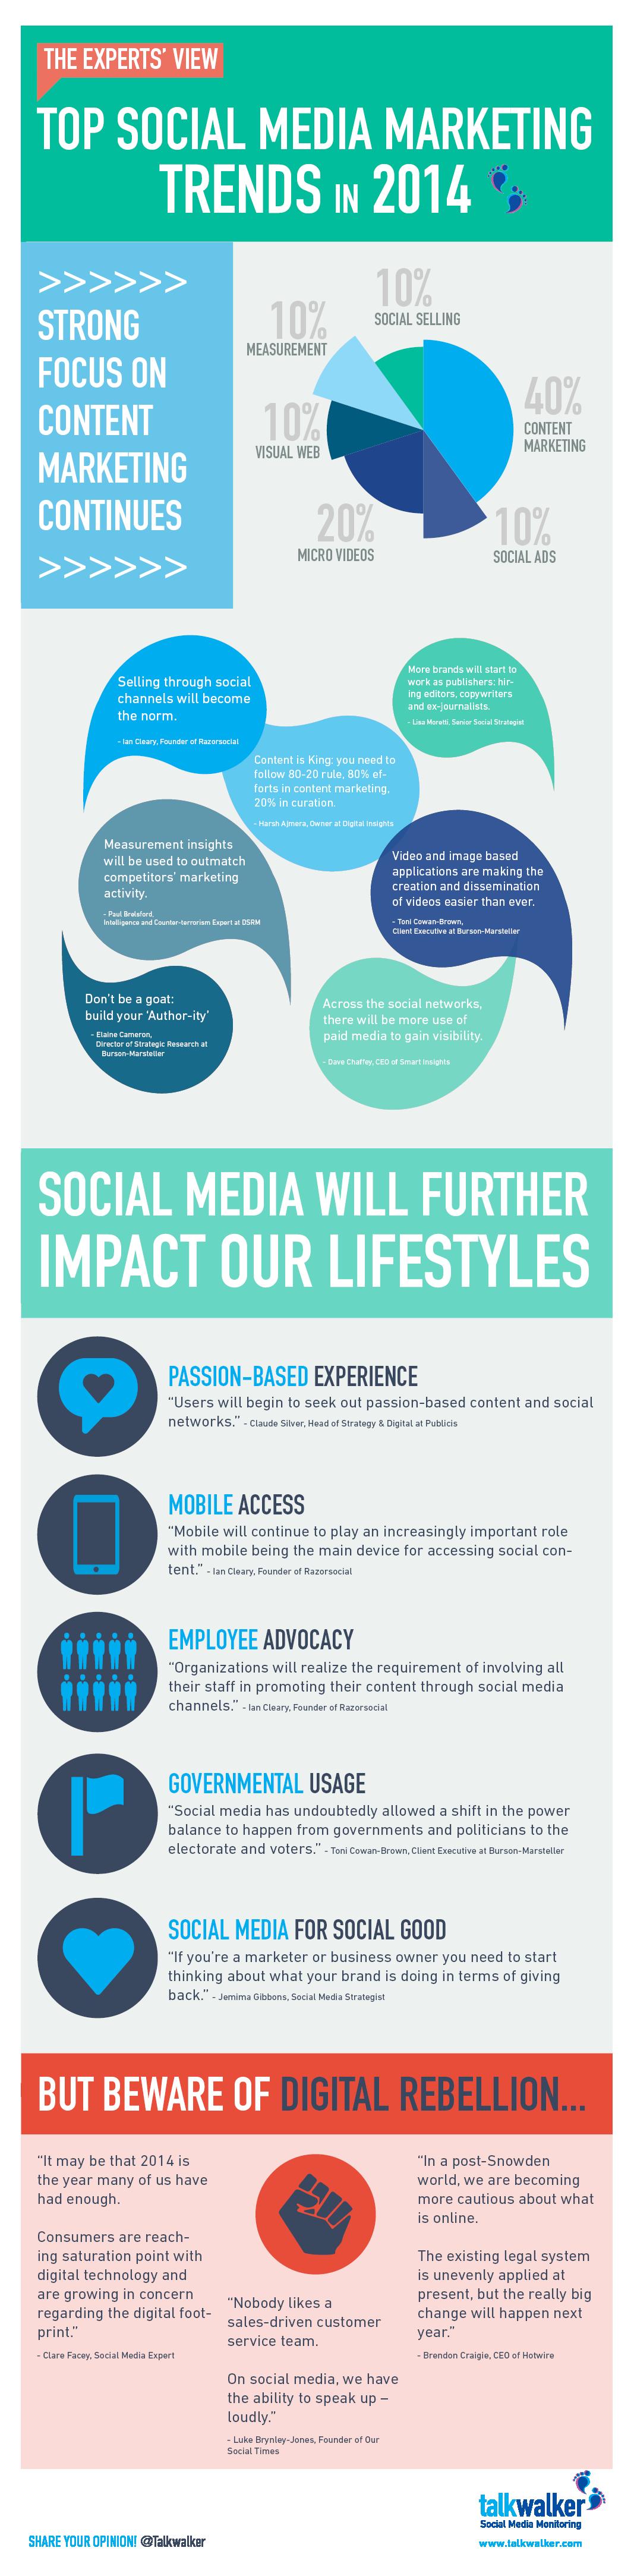 2014 top social media trends